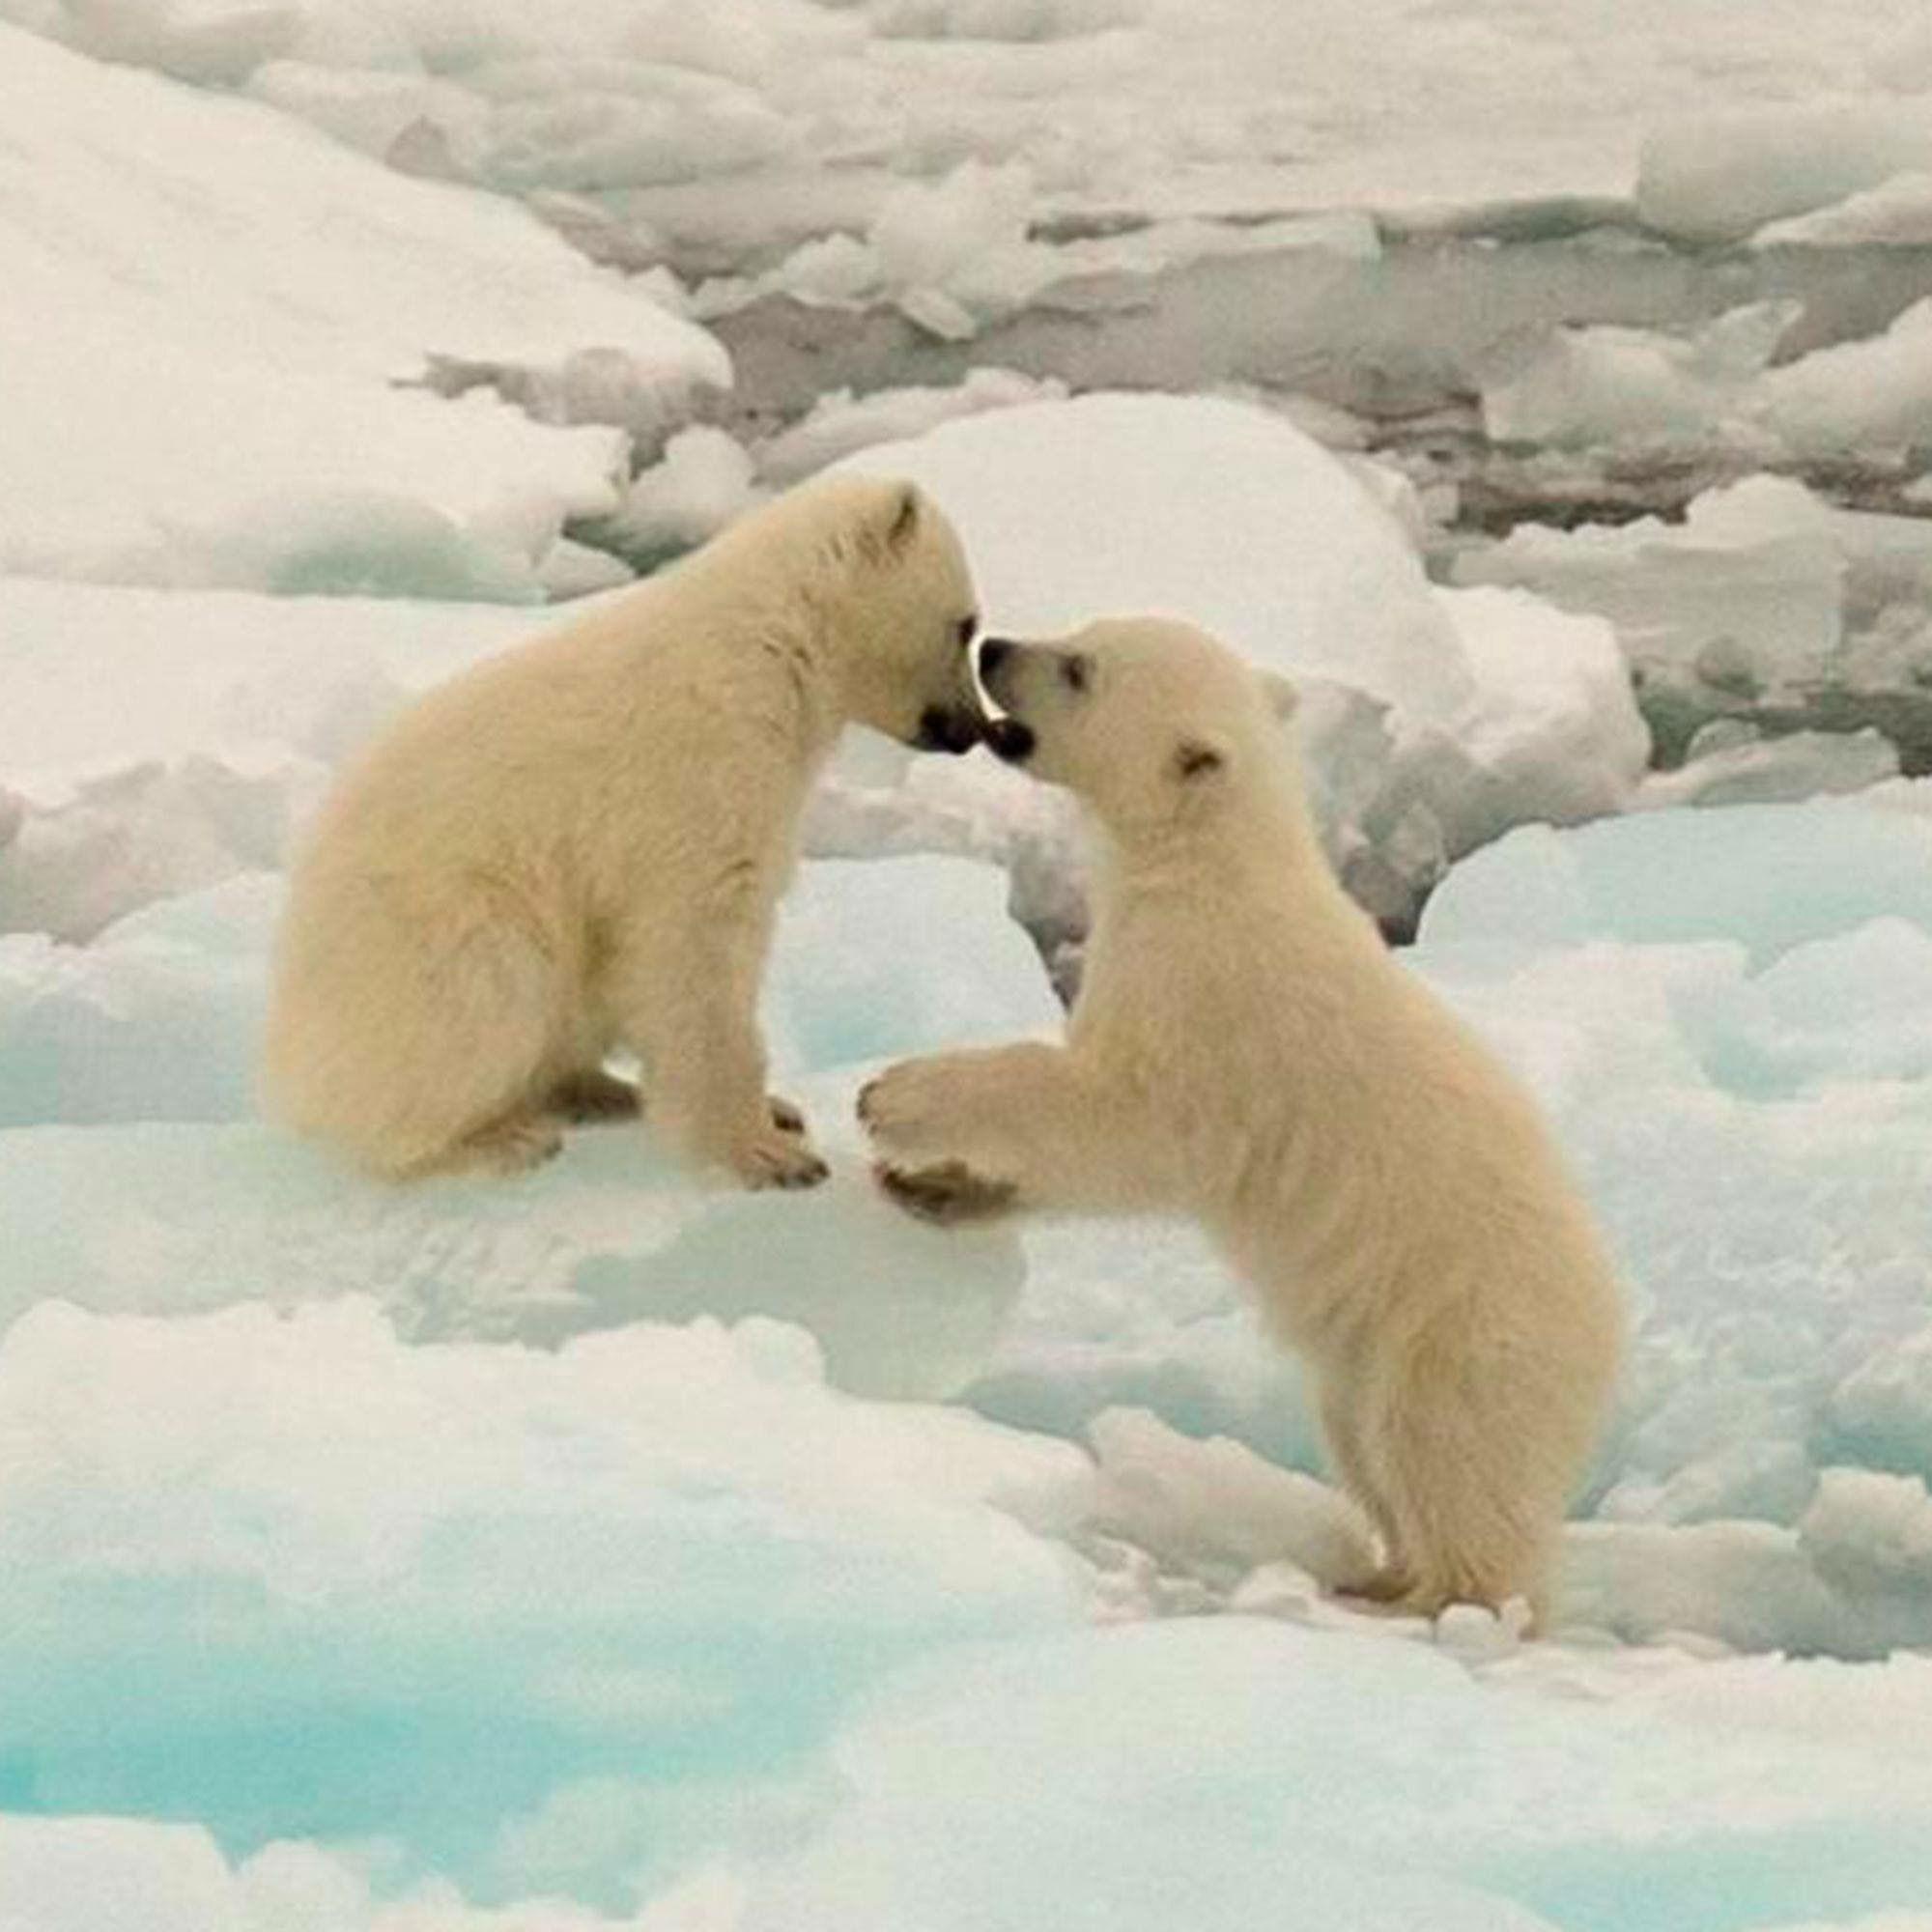 what is causing polar bears endangerment